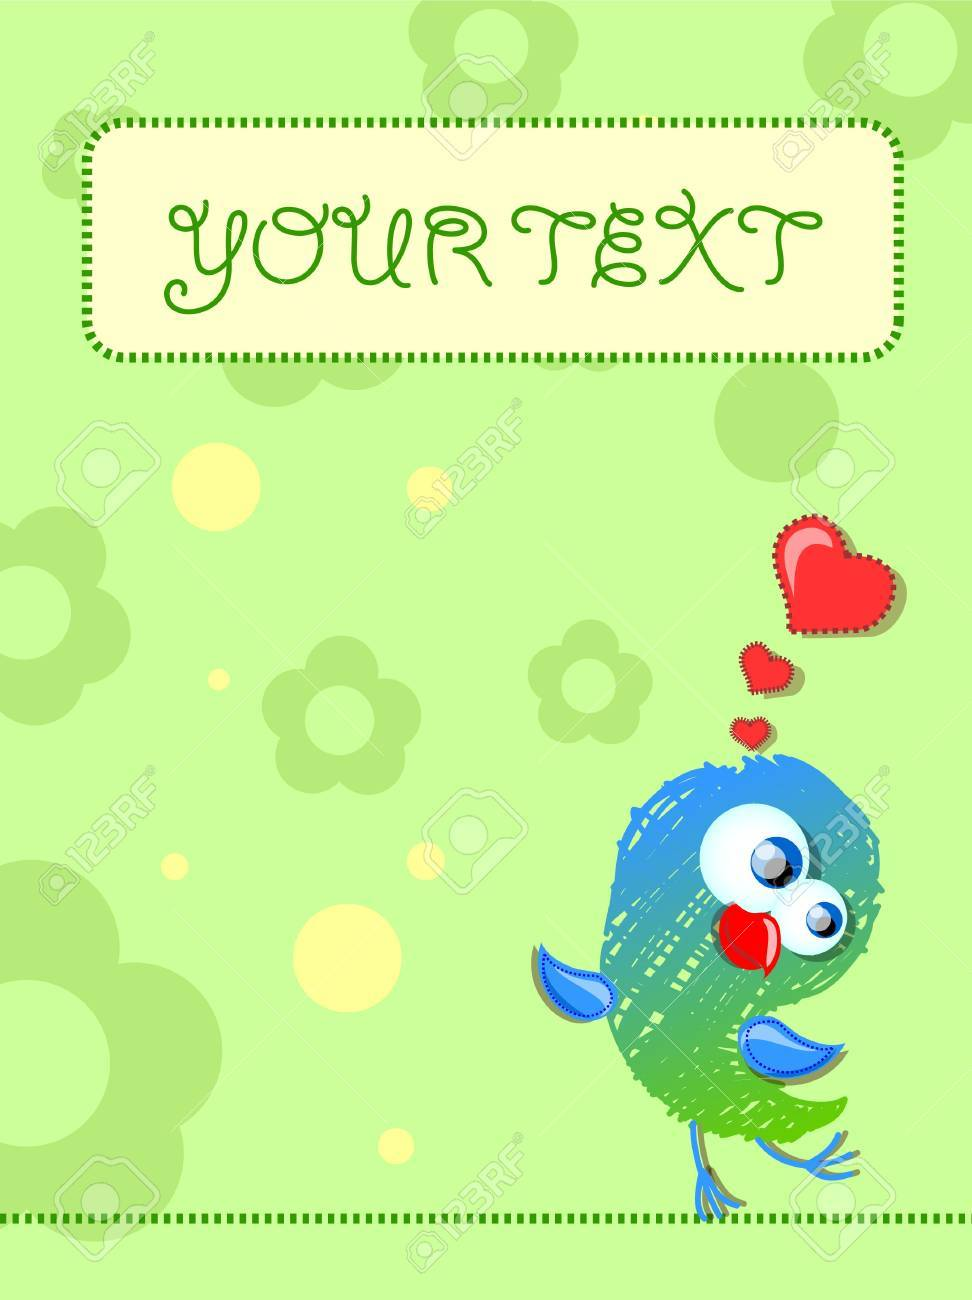 Lovely birds, card for your design Stock Vector - 11499399